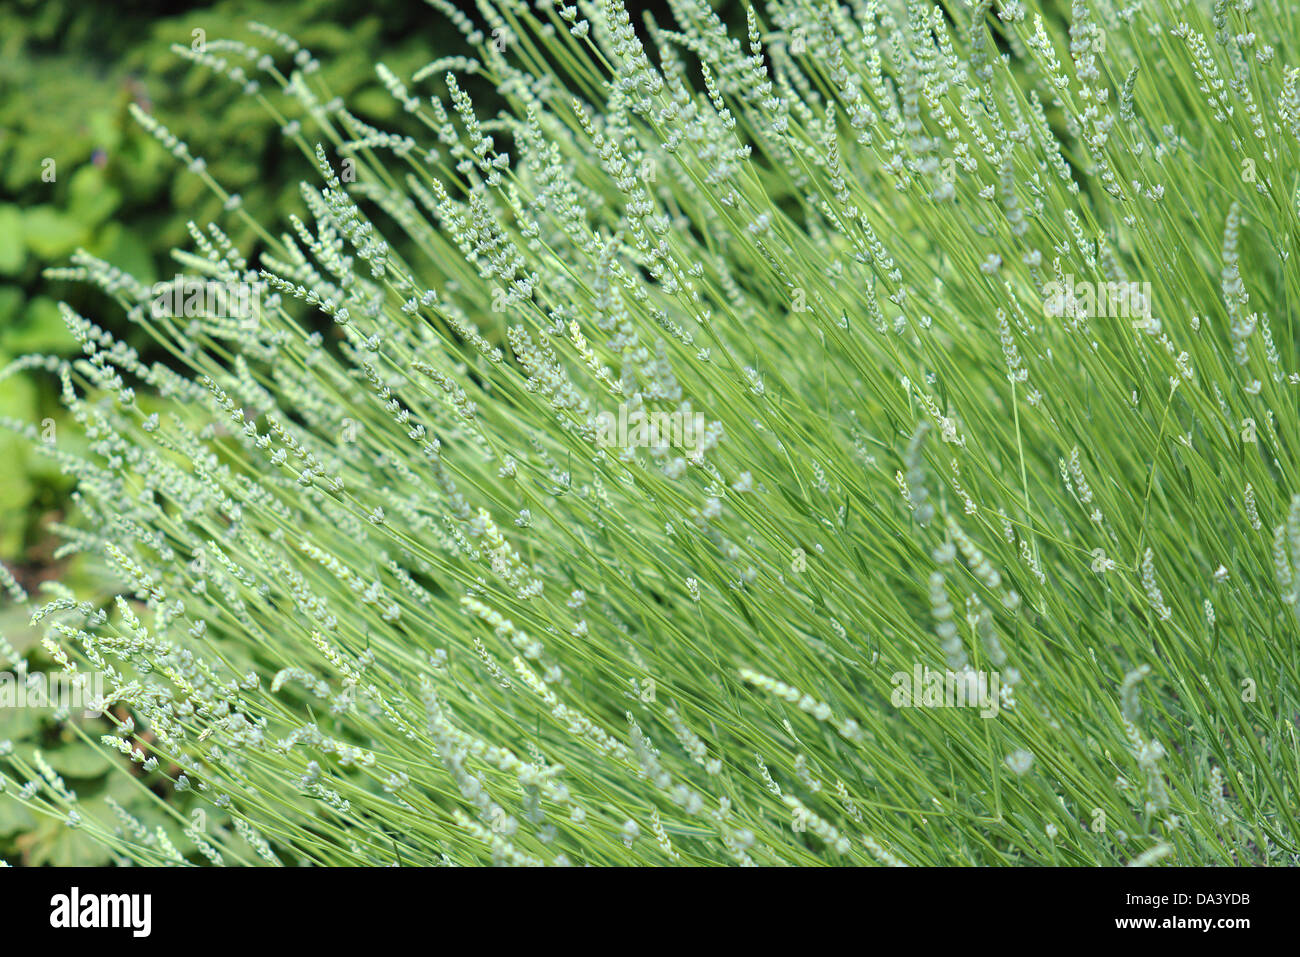 Lavande blanche \u0027Edelweiss\u0027 Lavandula angustifolia fleurs